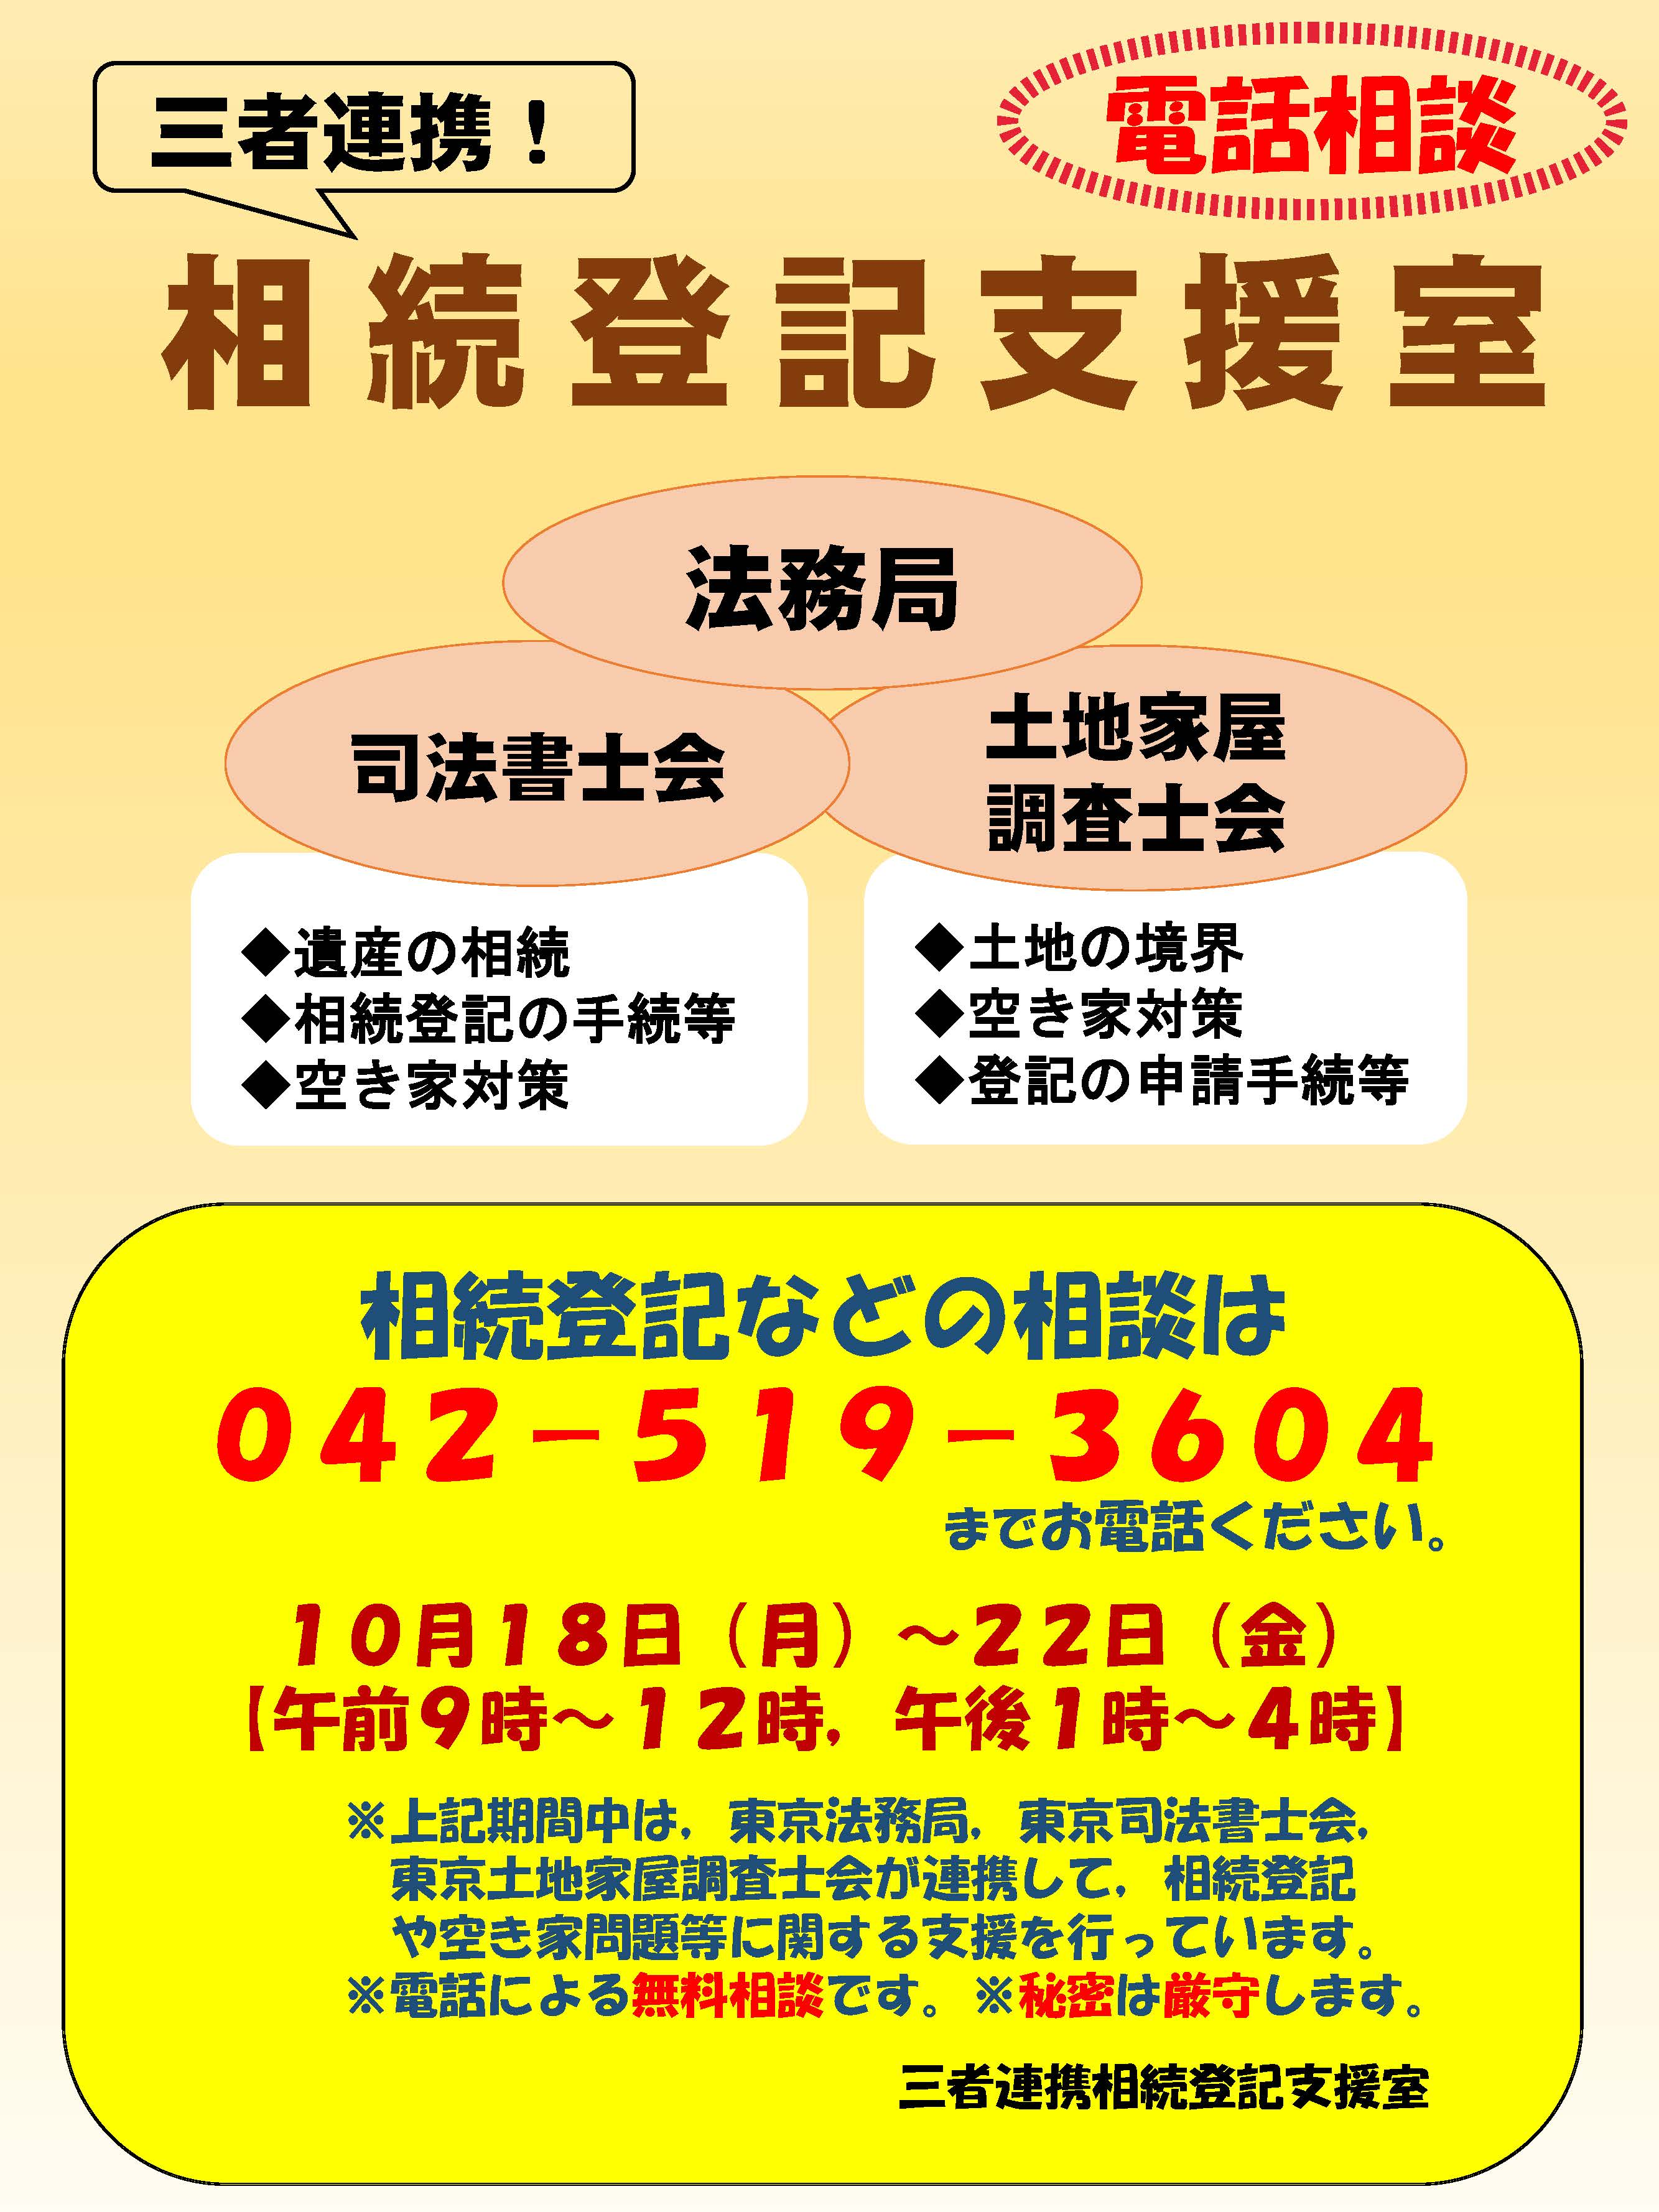 ②【1018~22】相続登記支援室電話無料相談案内チラシ.jpg